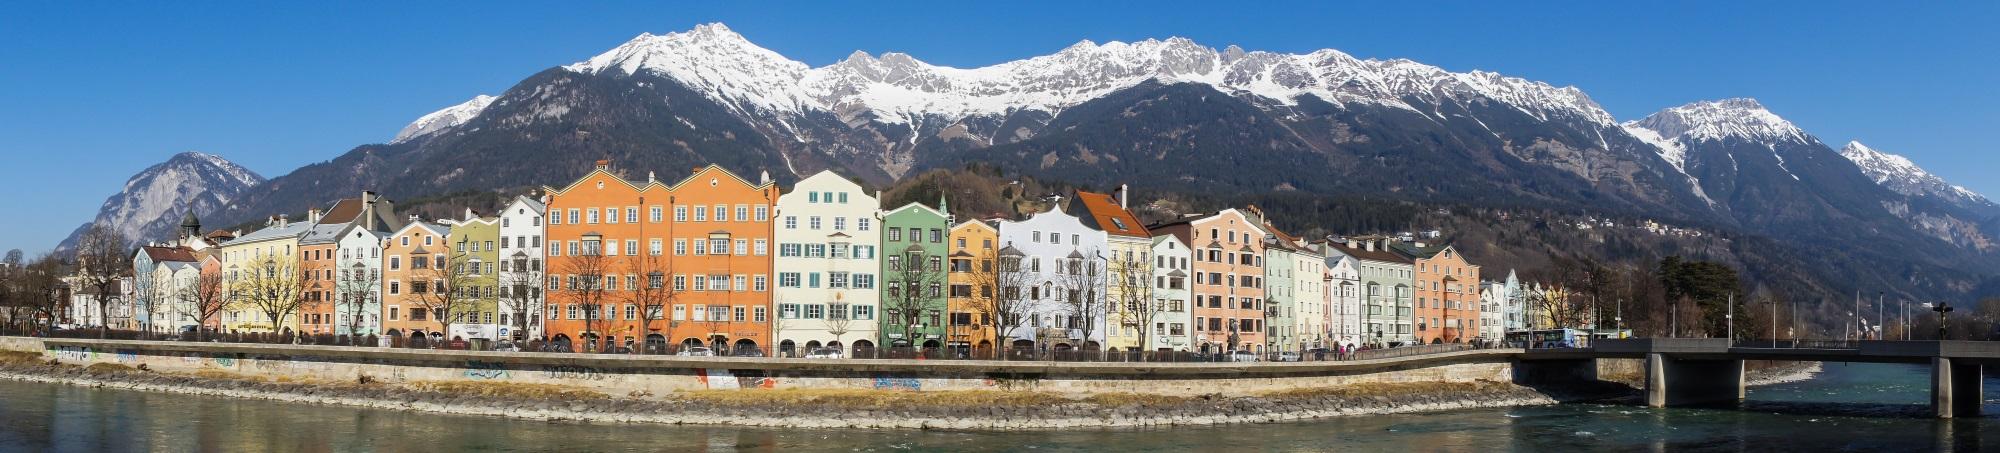 Innsbruck Städtereisen Stadtteile